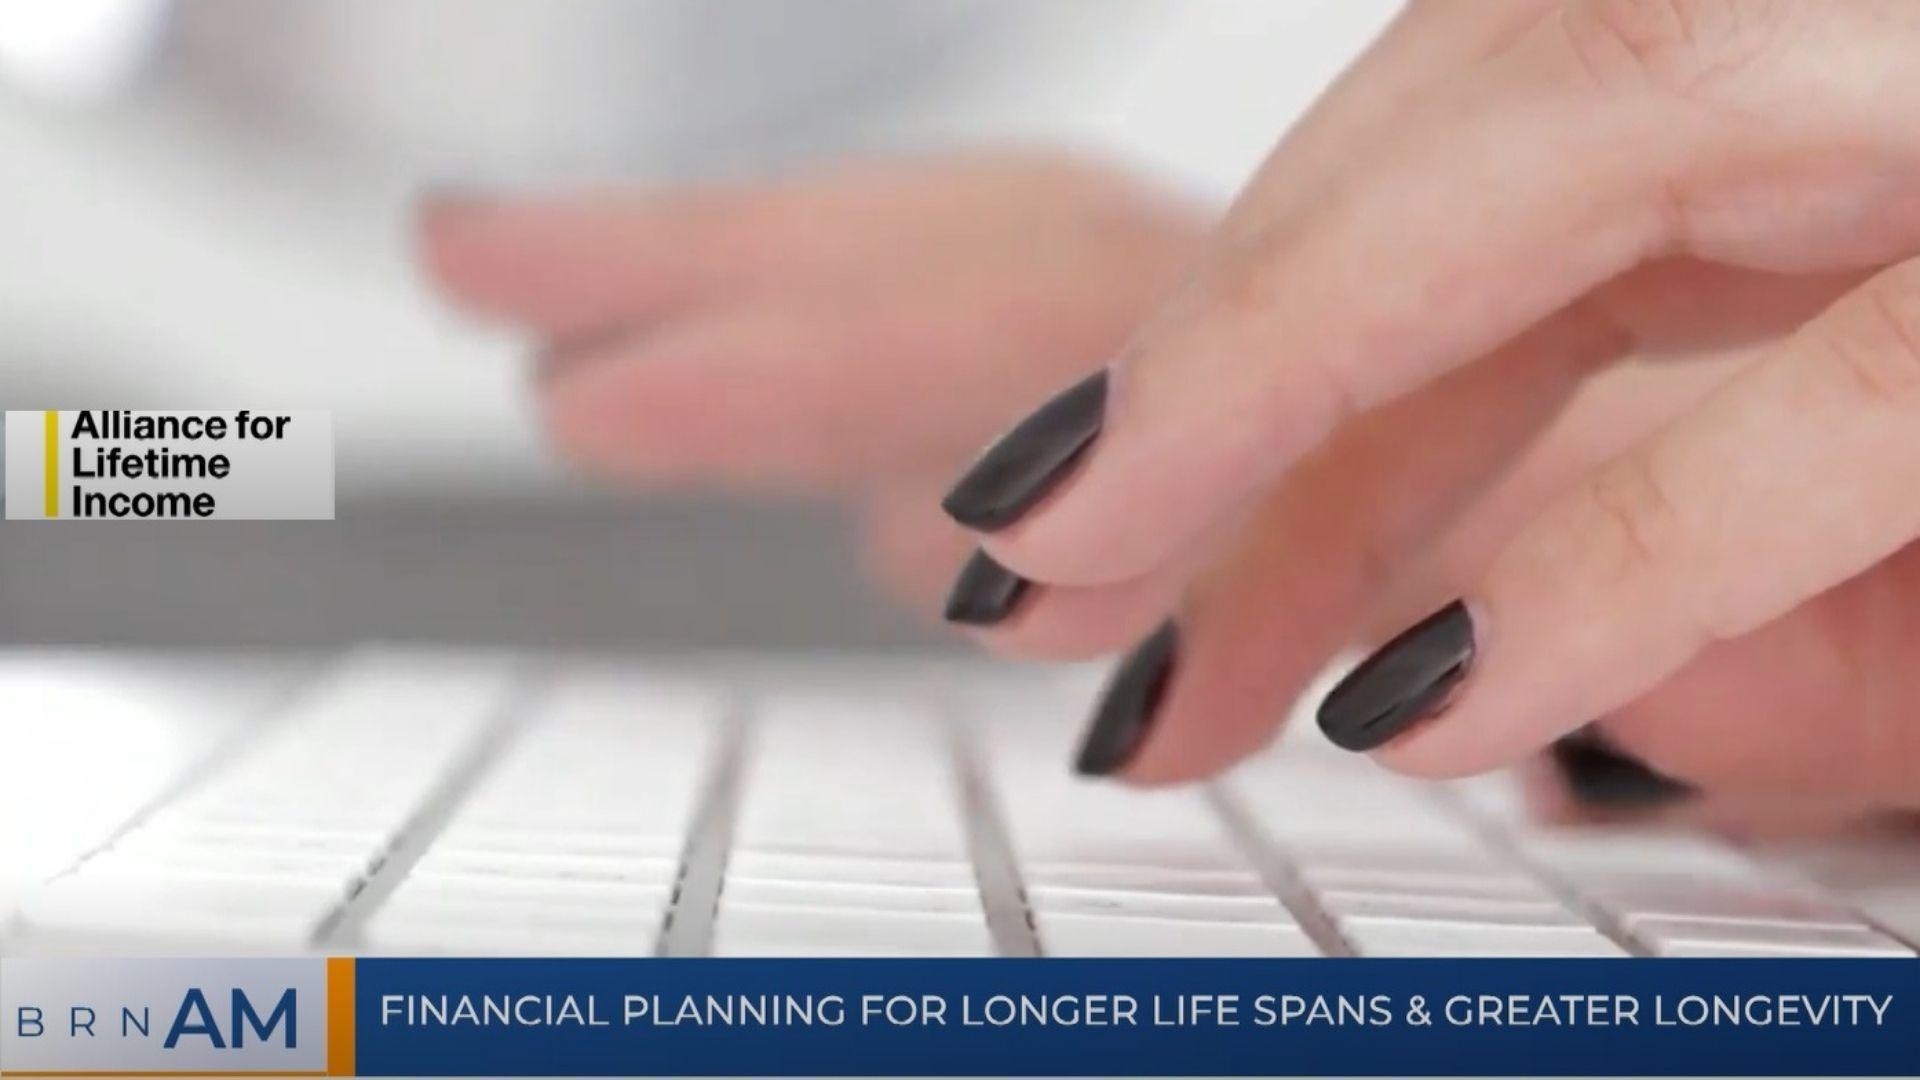 BRN AM   Financial planning for longer life spans & greater longevity